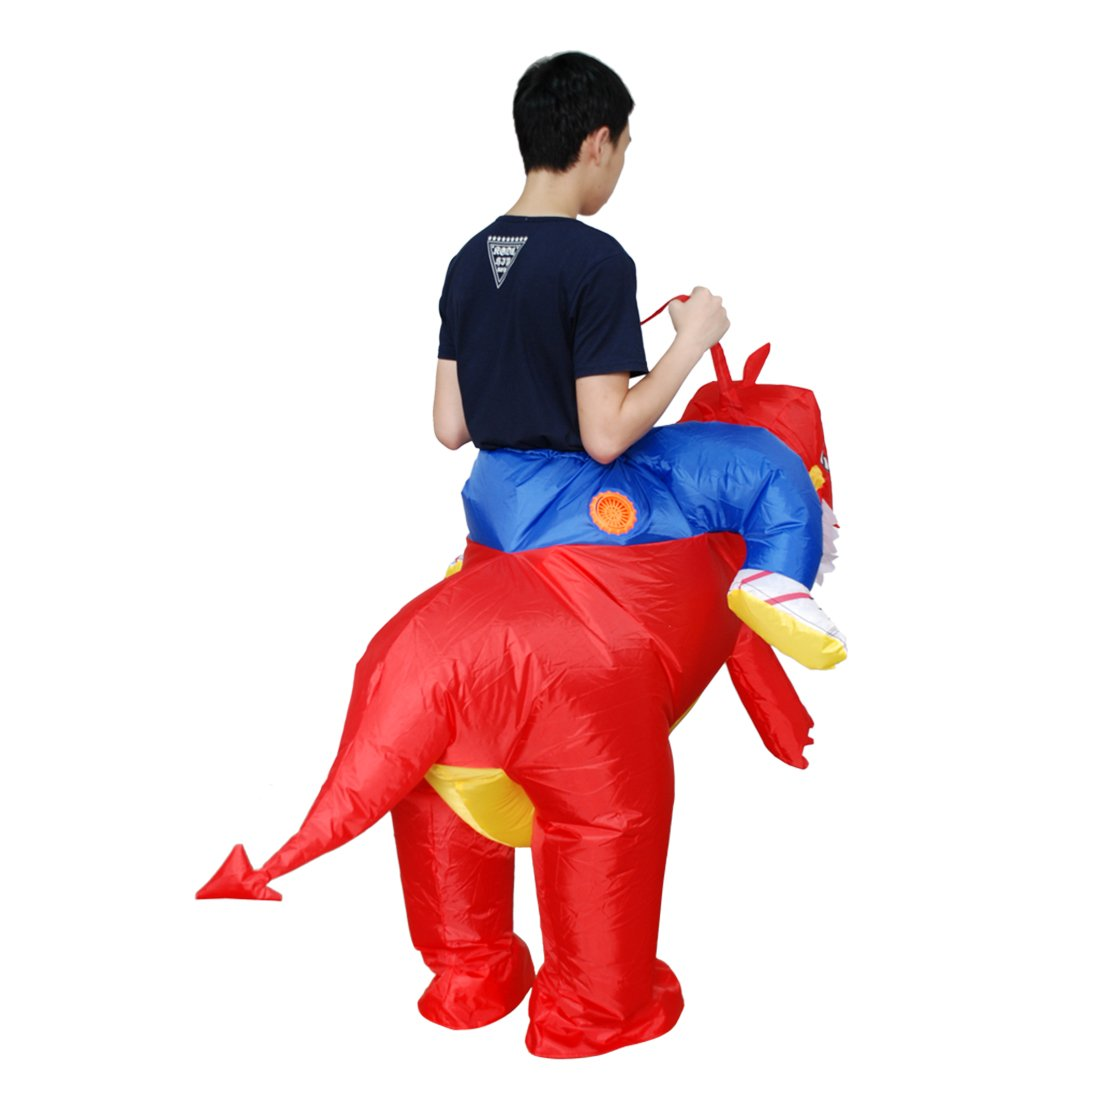 Kooy Inflatable Dinosaur Unicorn Cowboy Costume Halloween Costume Inflatable Costumes for Adults (red Dinosaur) by Kooy (Image #3)